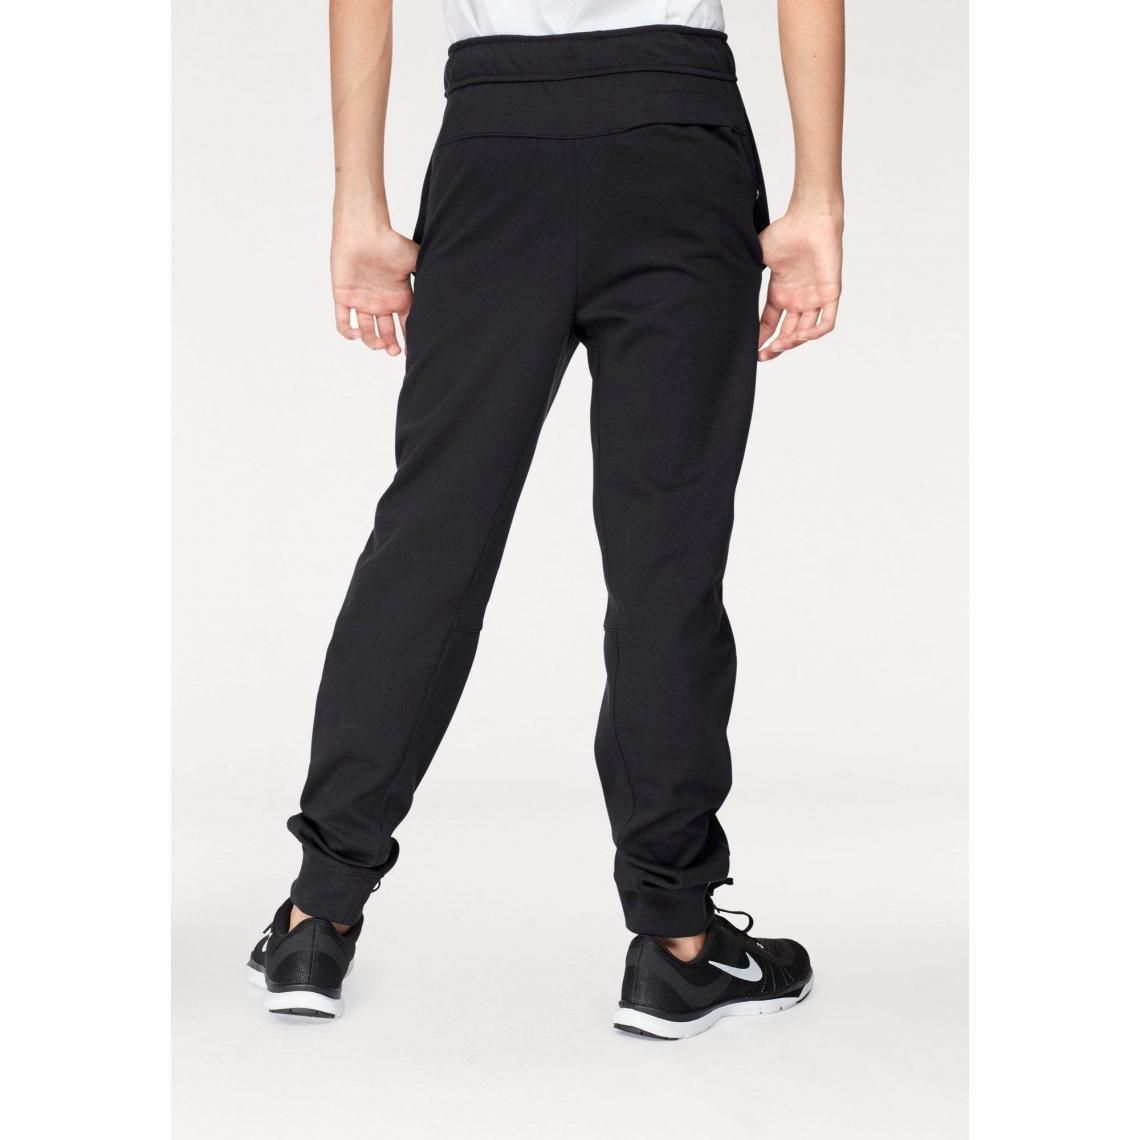 De Jogging Noir Junior Av15 3suisses Nike Pantalon Sportswear Hd5Bxaqw